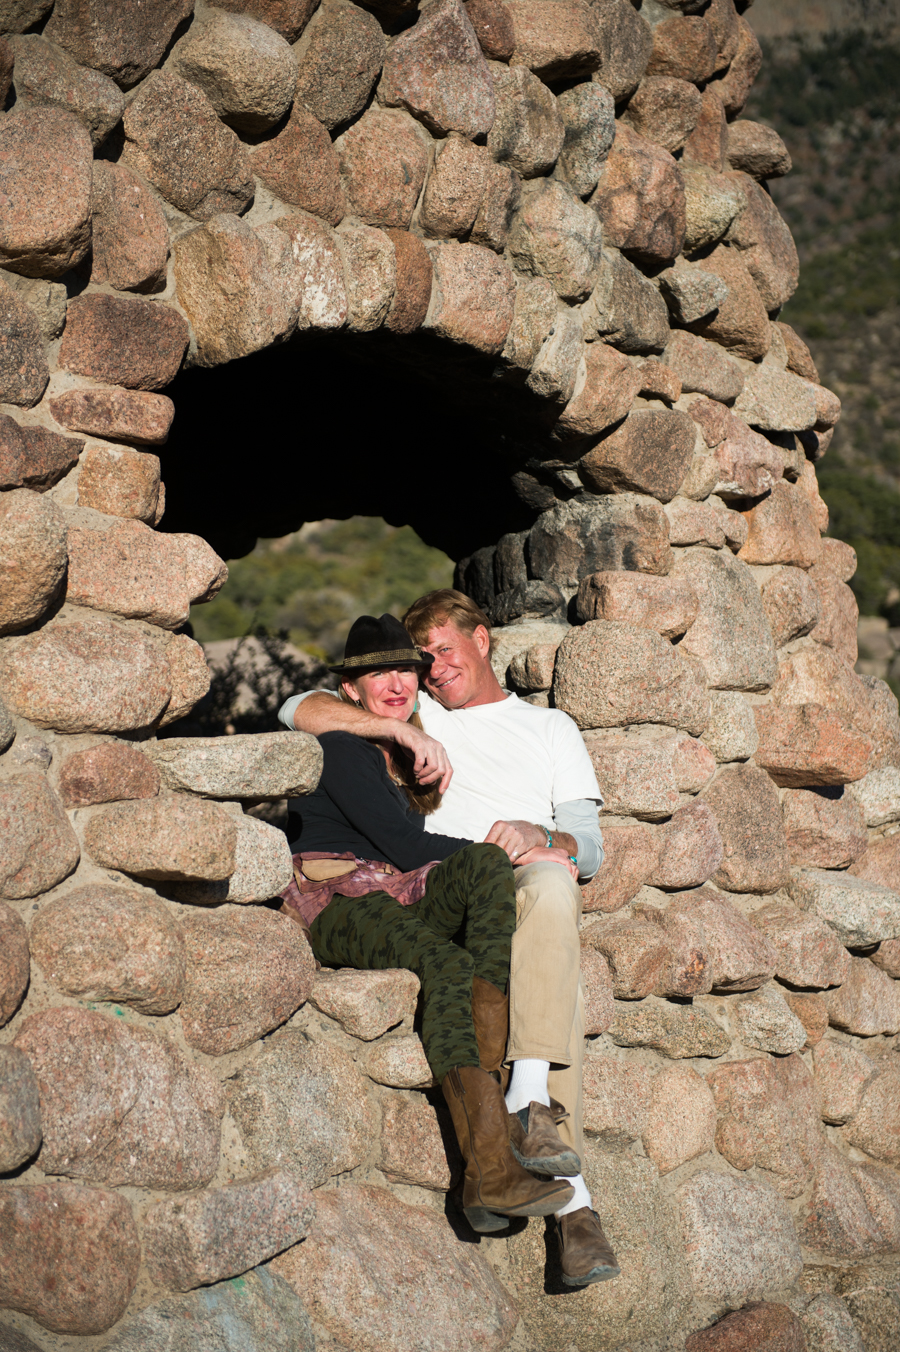 New-Mexico-Elizabeth-Craig-Photography-1-2.jpg